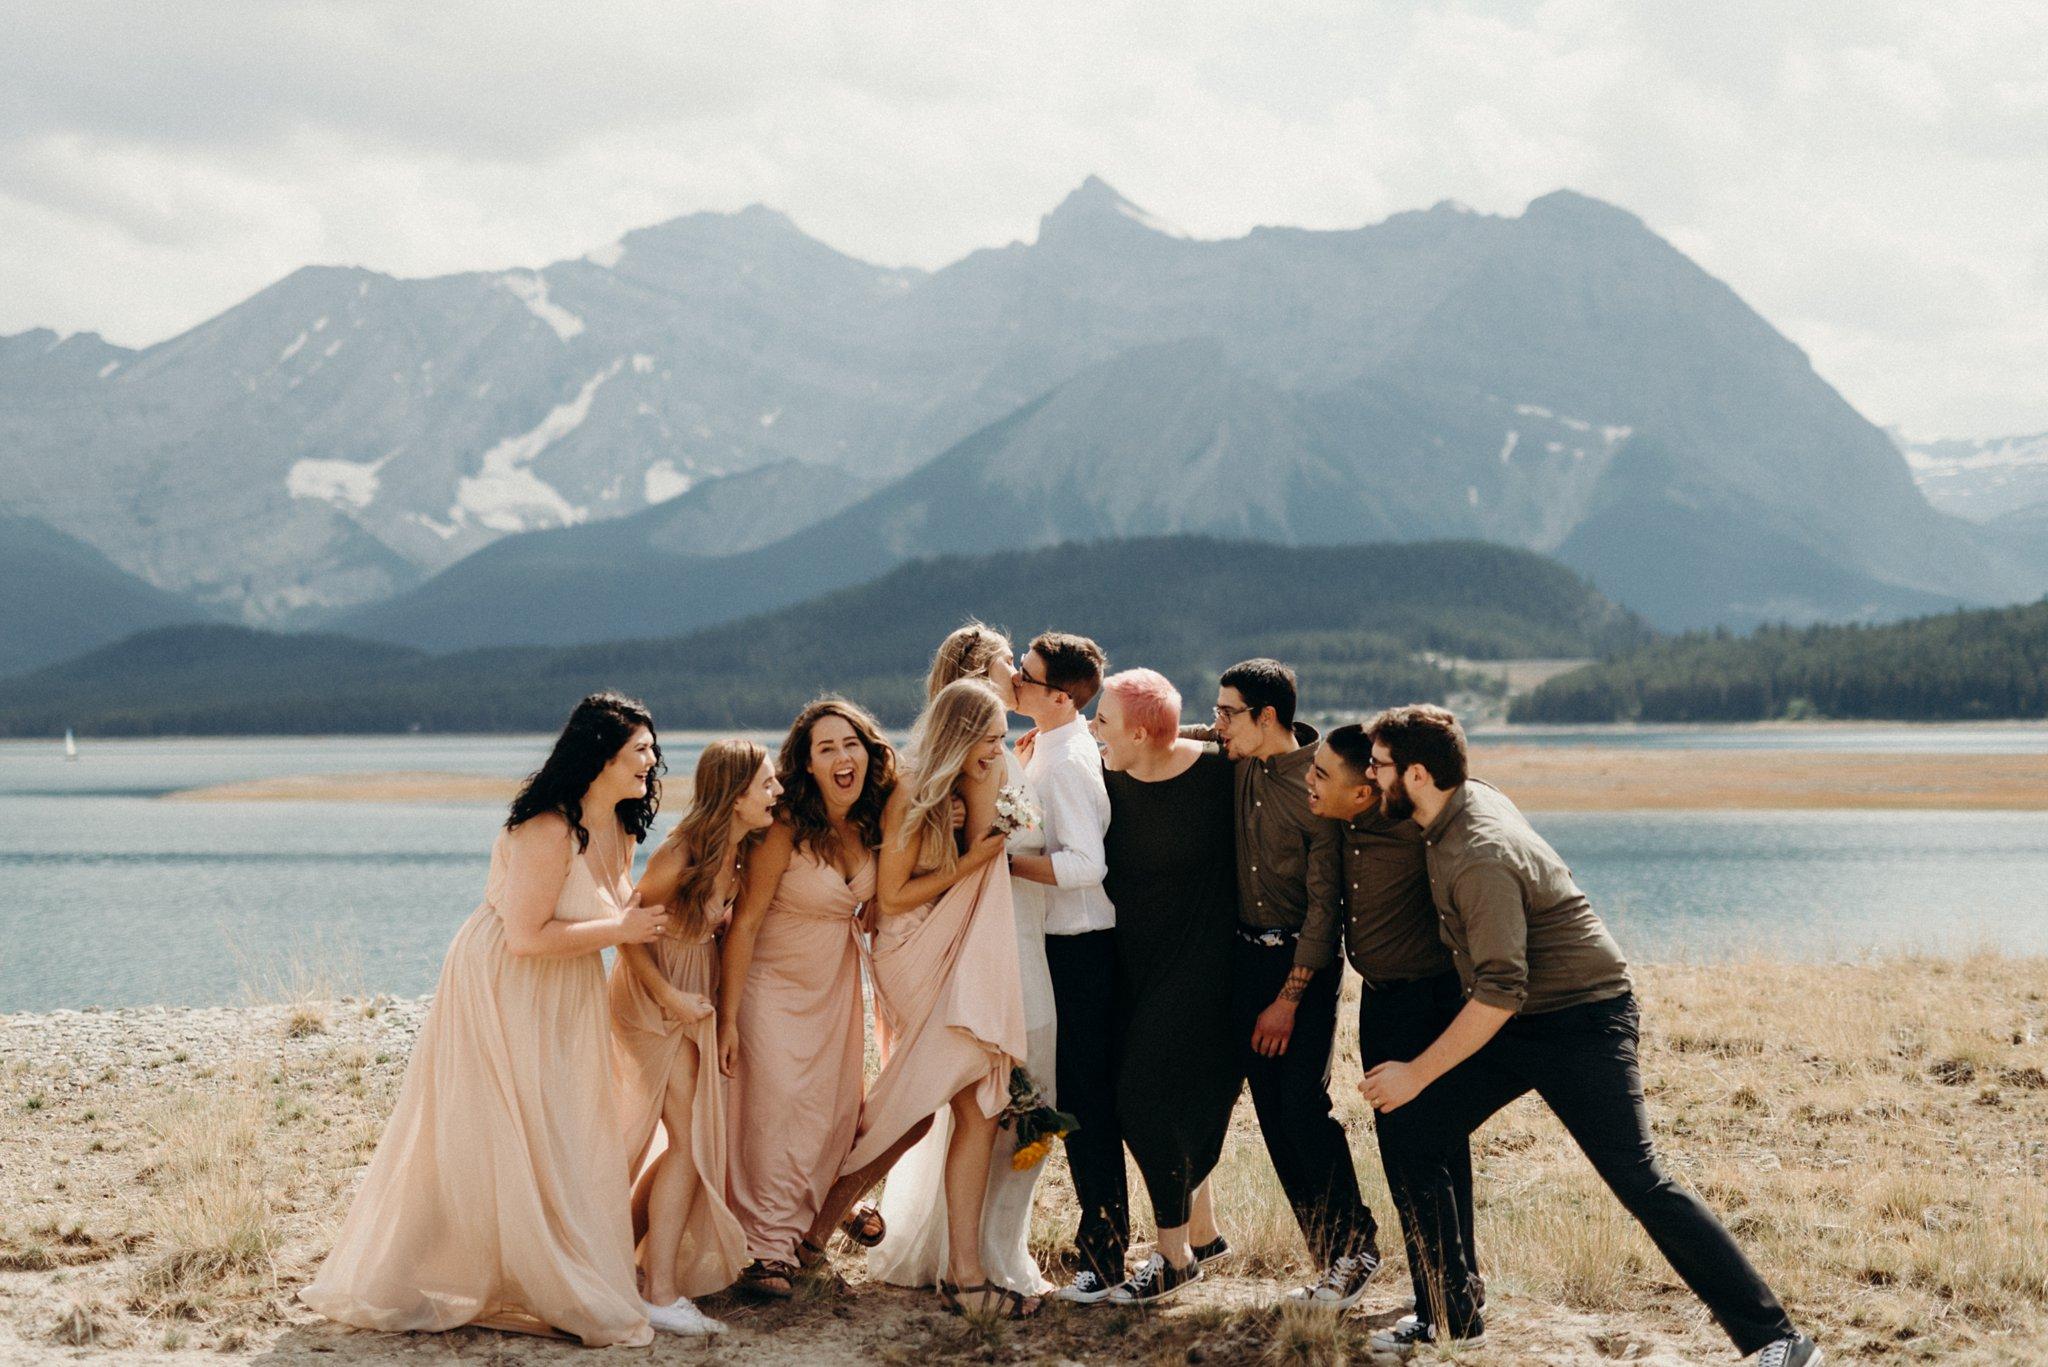 kaihla_tonai_intimate_wedding_elopement_photographer_6392.jpg